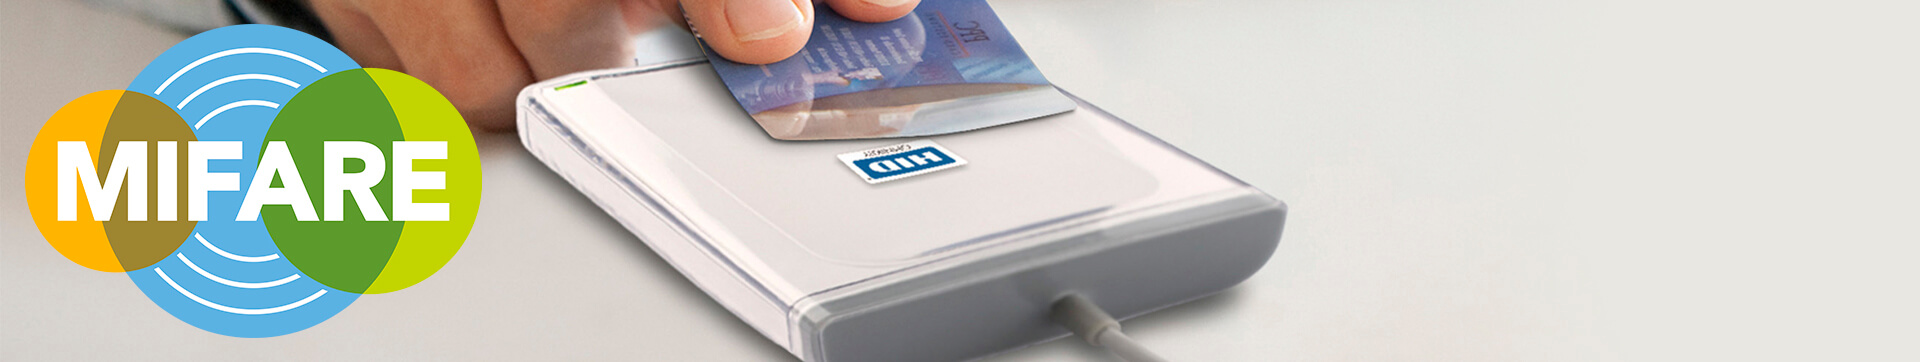 MIFARE® RFID card reader - YouCard